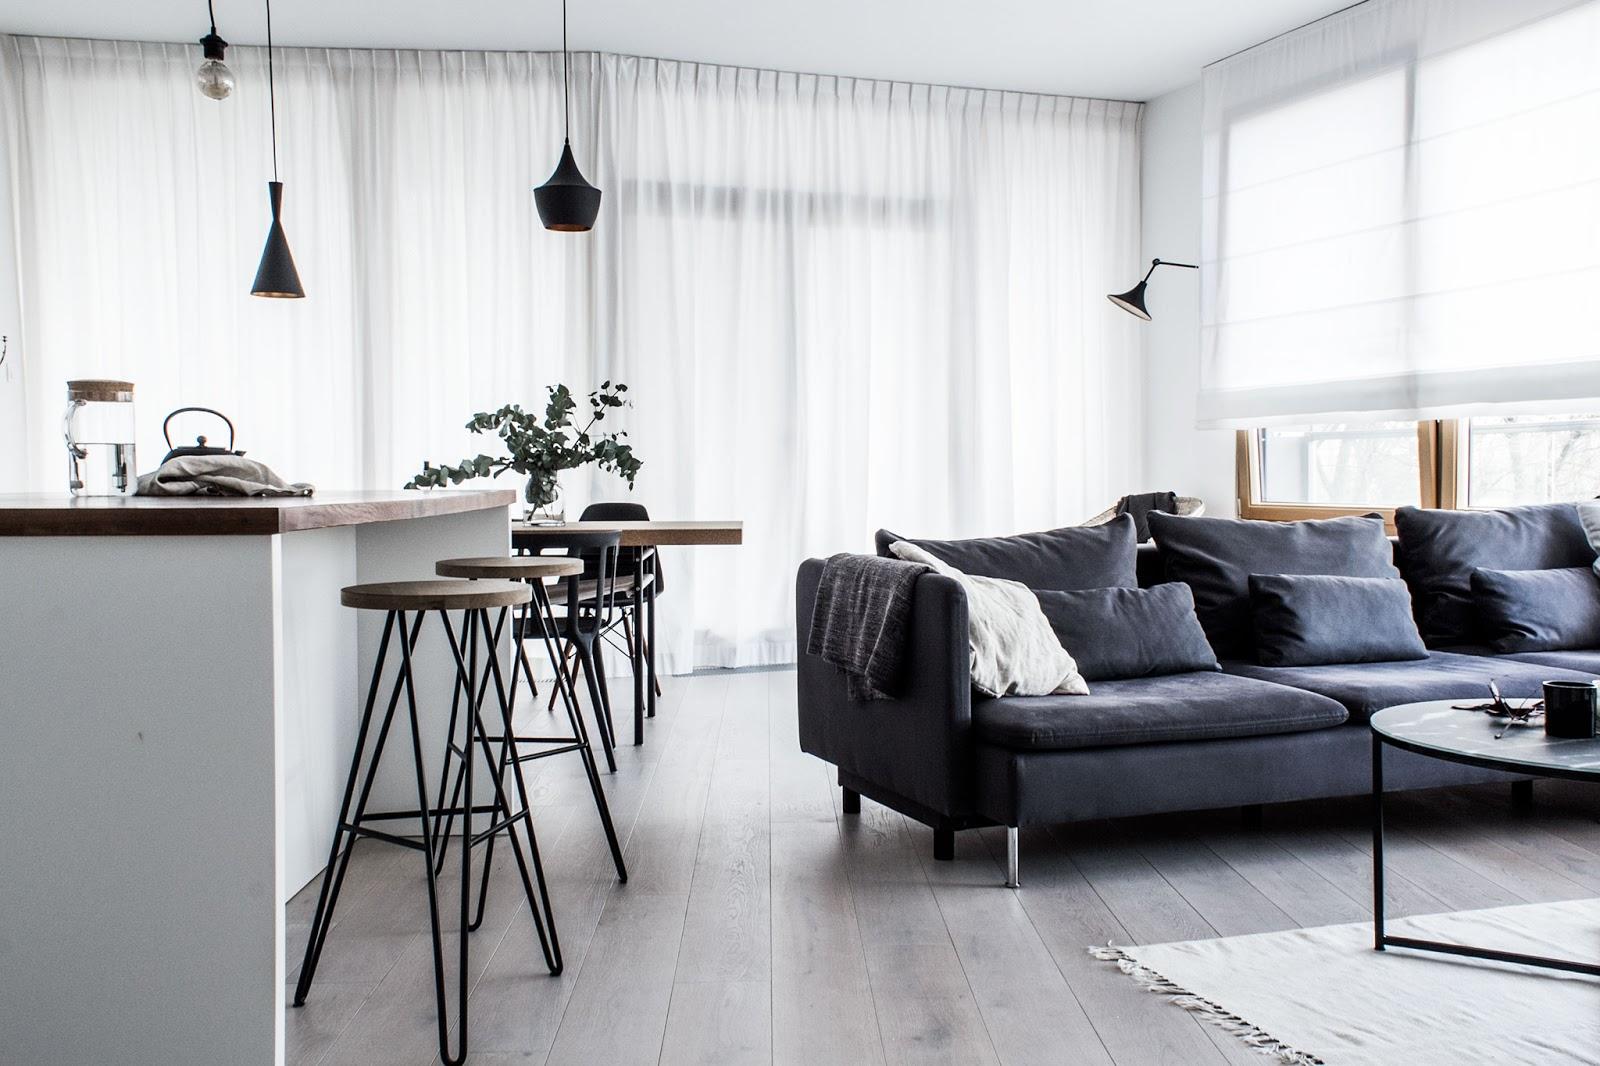 wire bar stools, tom dixon lamps, white scandinavian interior